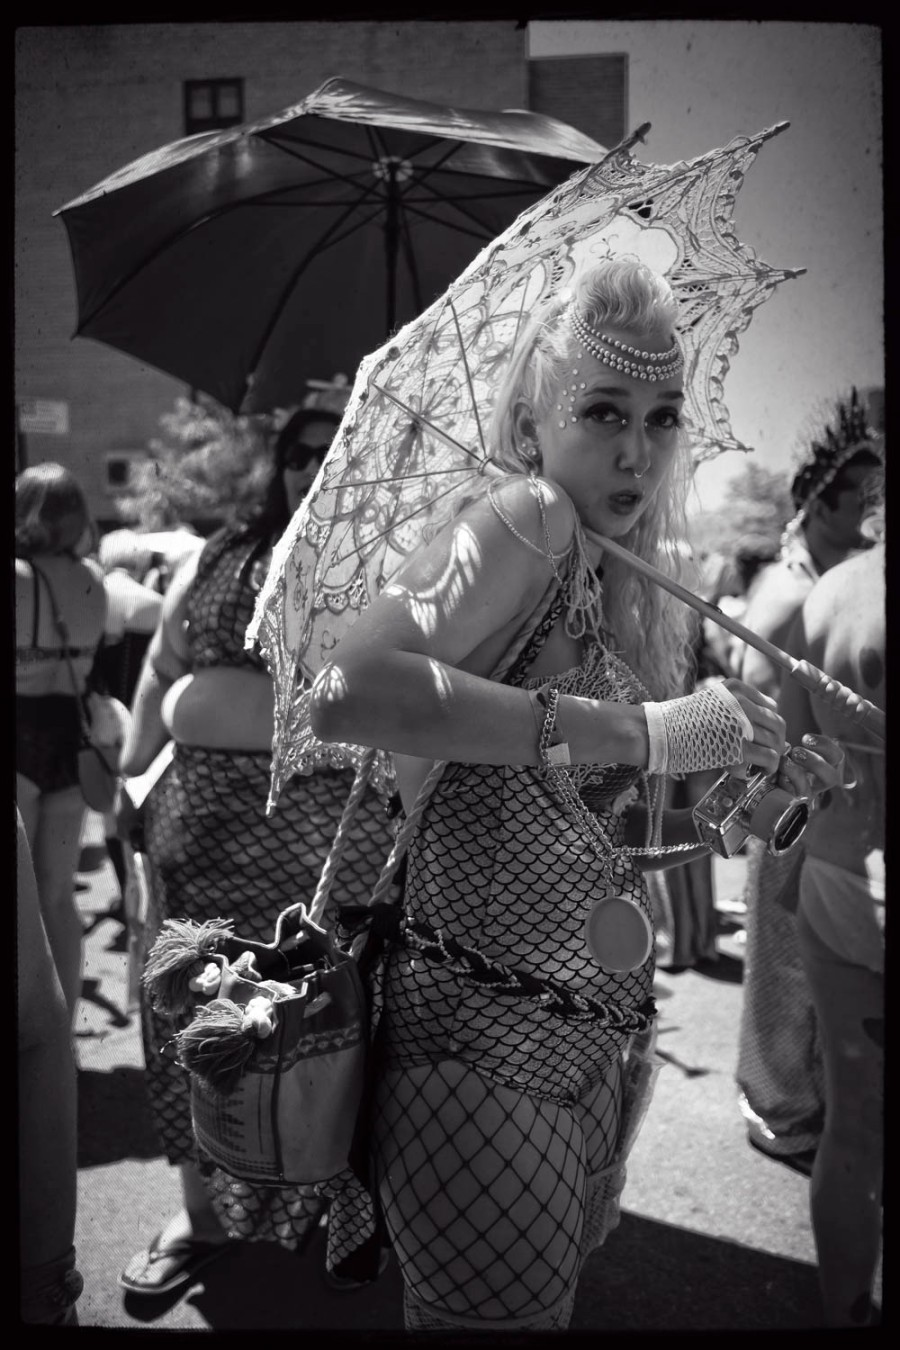 2016 Coney Island Mermaid Parade